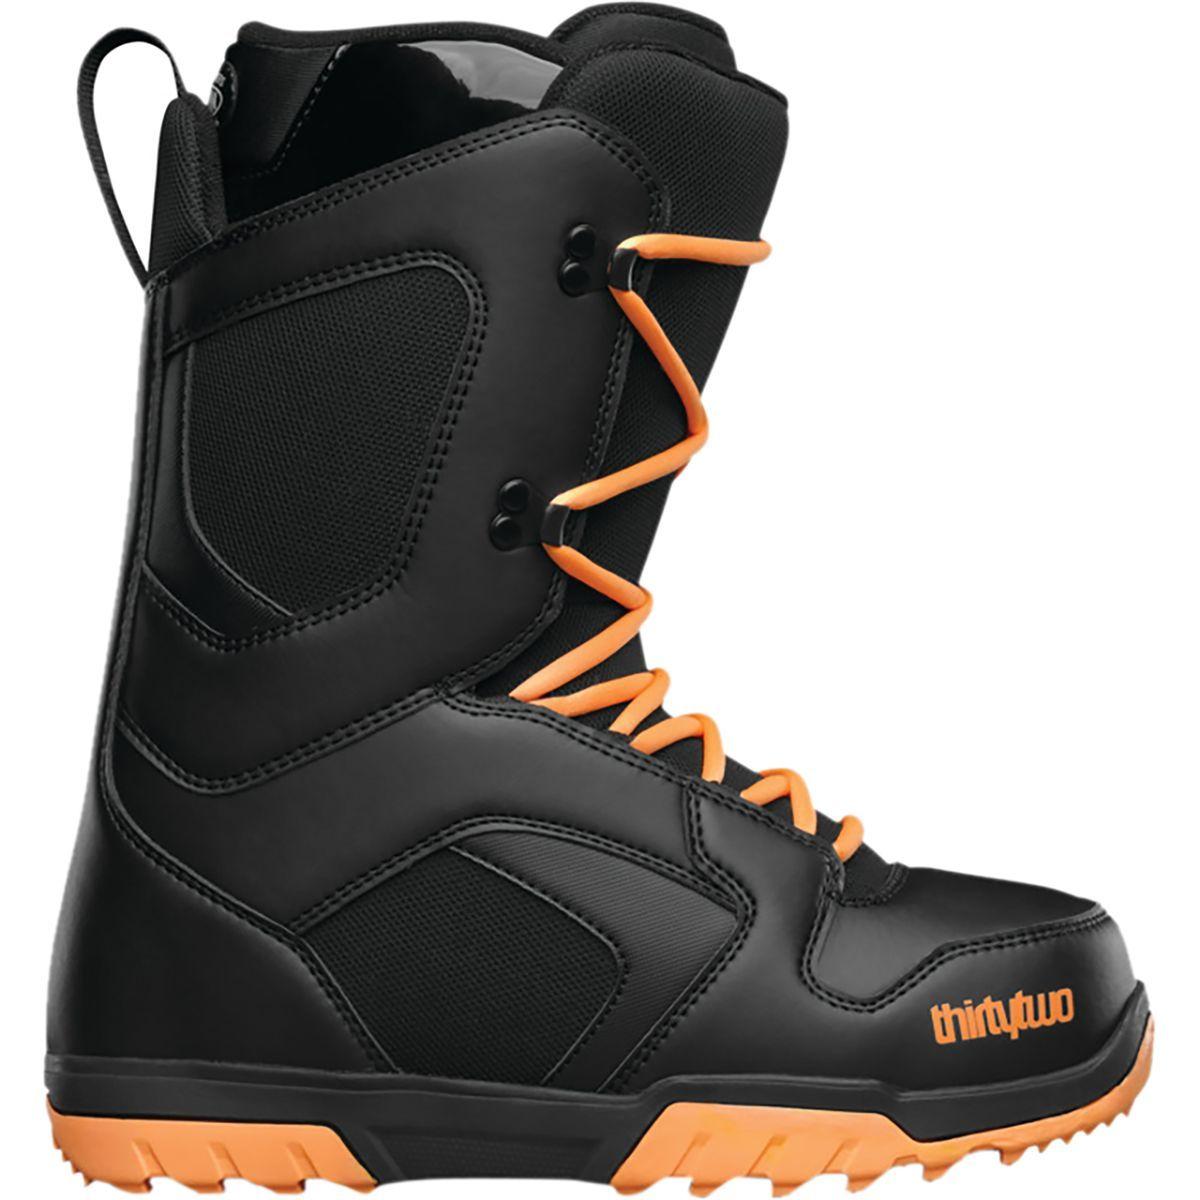 ThirtyTwo Exit Snowboard Boot Black/Orange 11.0 Boots